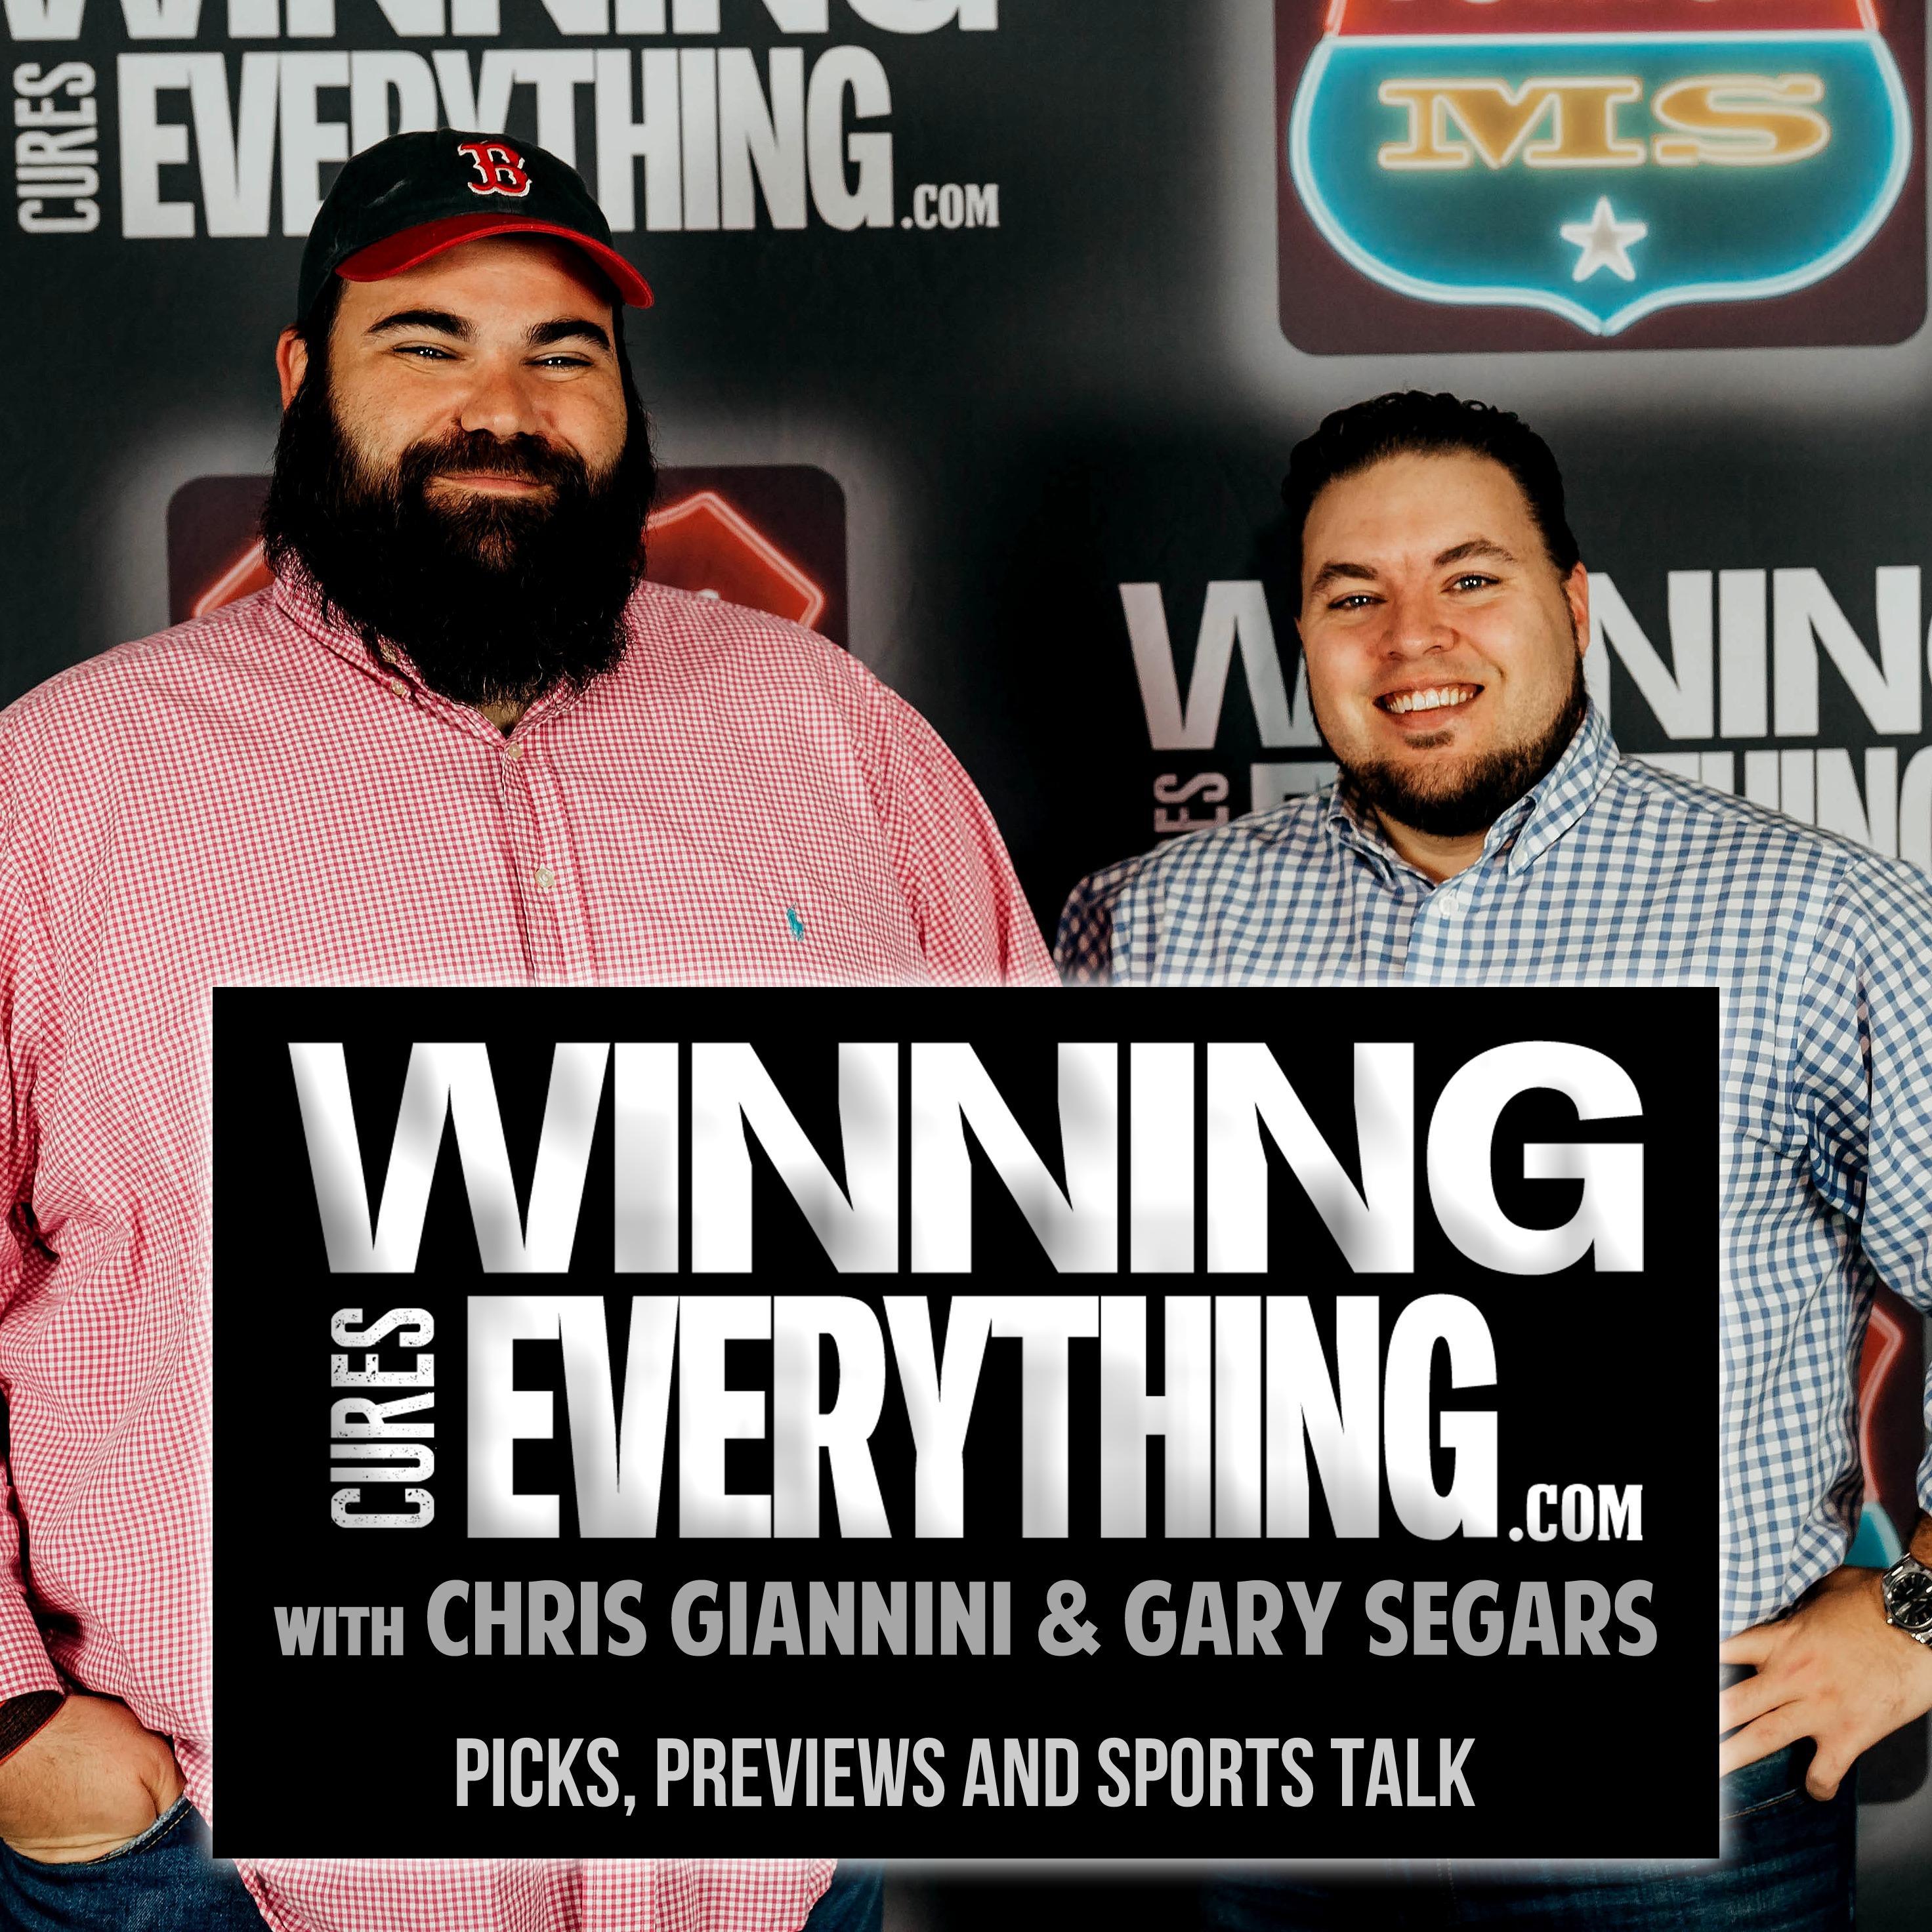 college-football-week-11-gambling-picks-against-the-spread_thumbnail.png